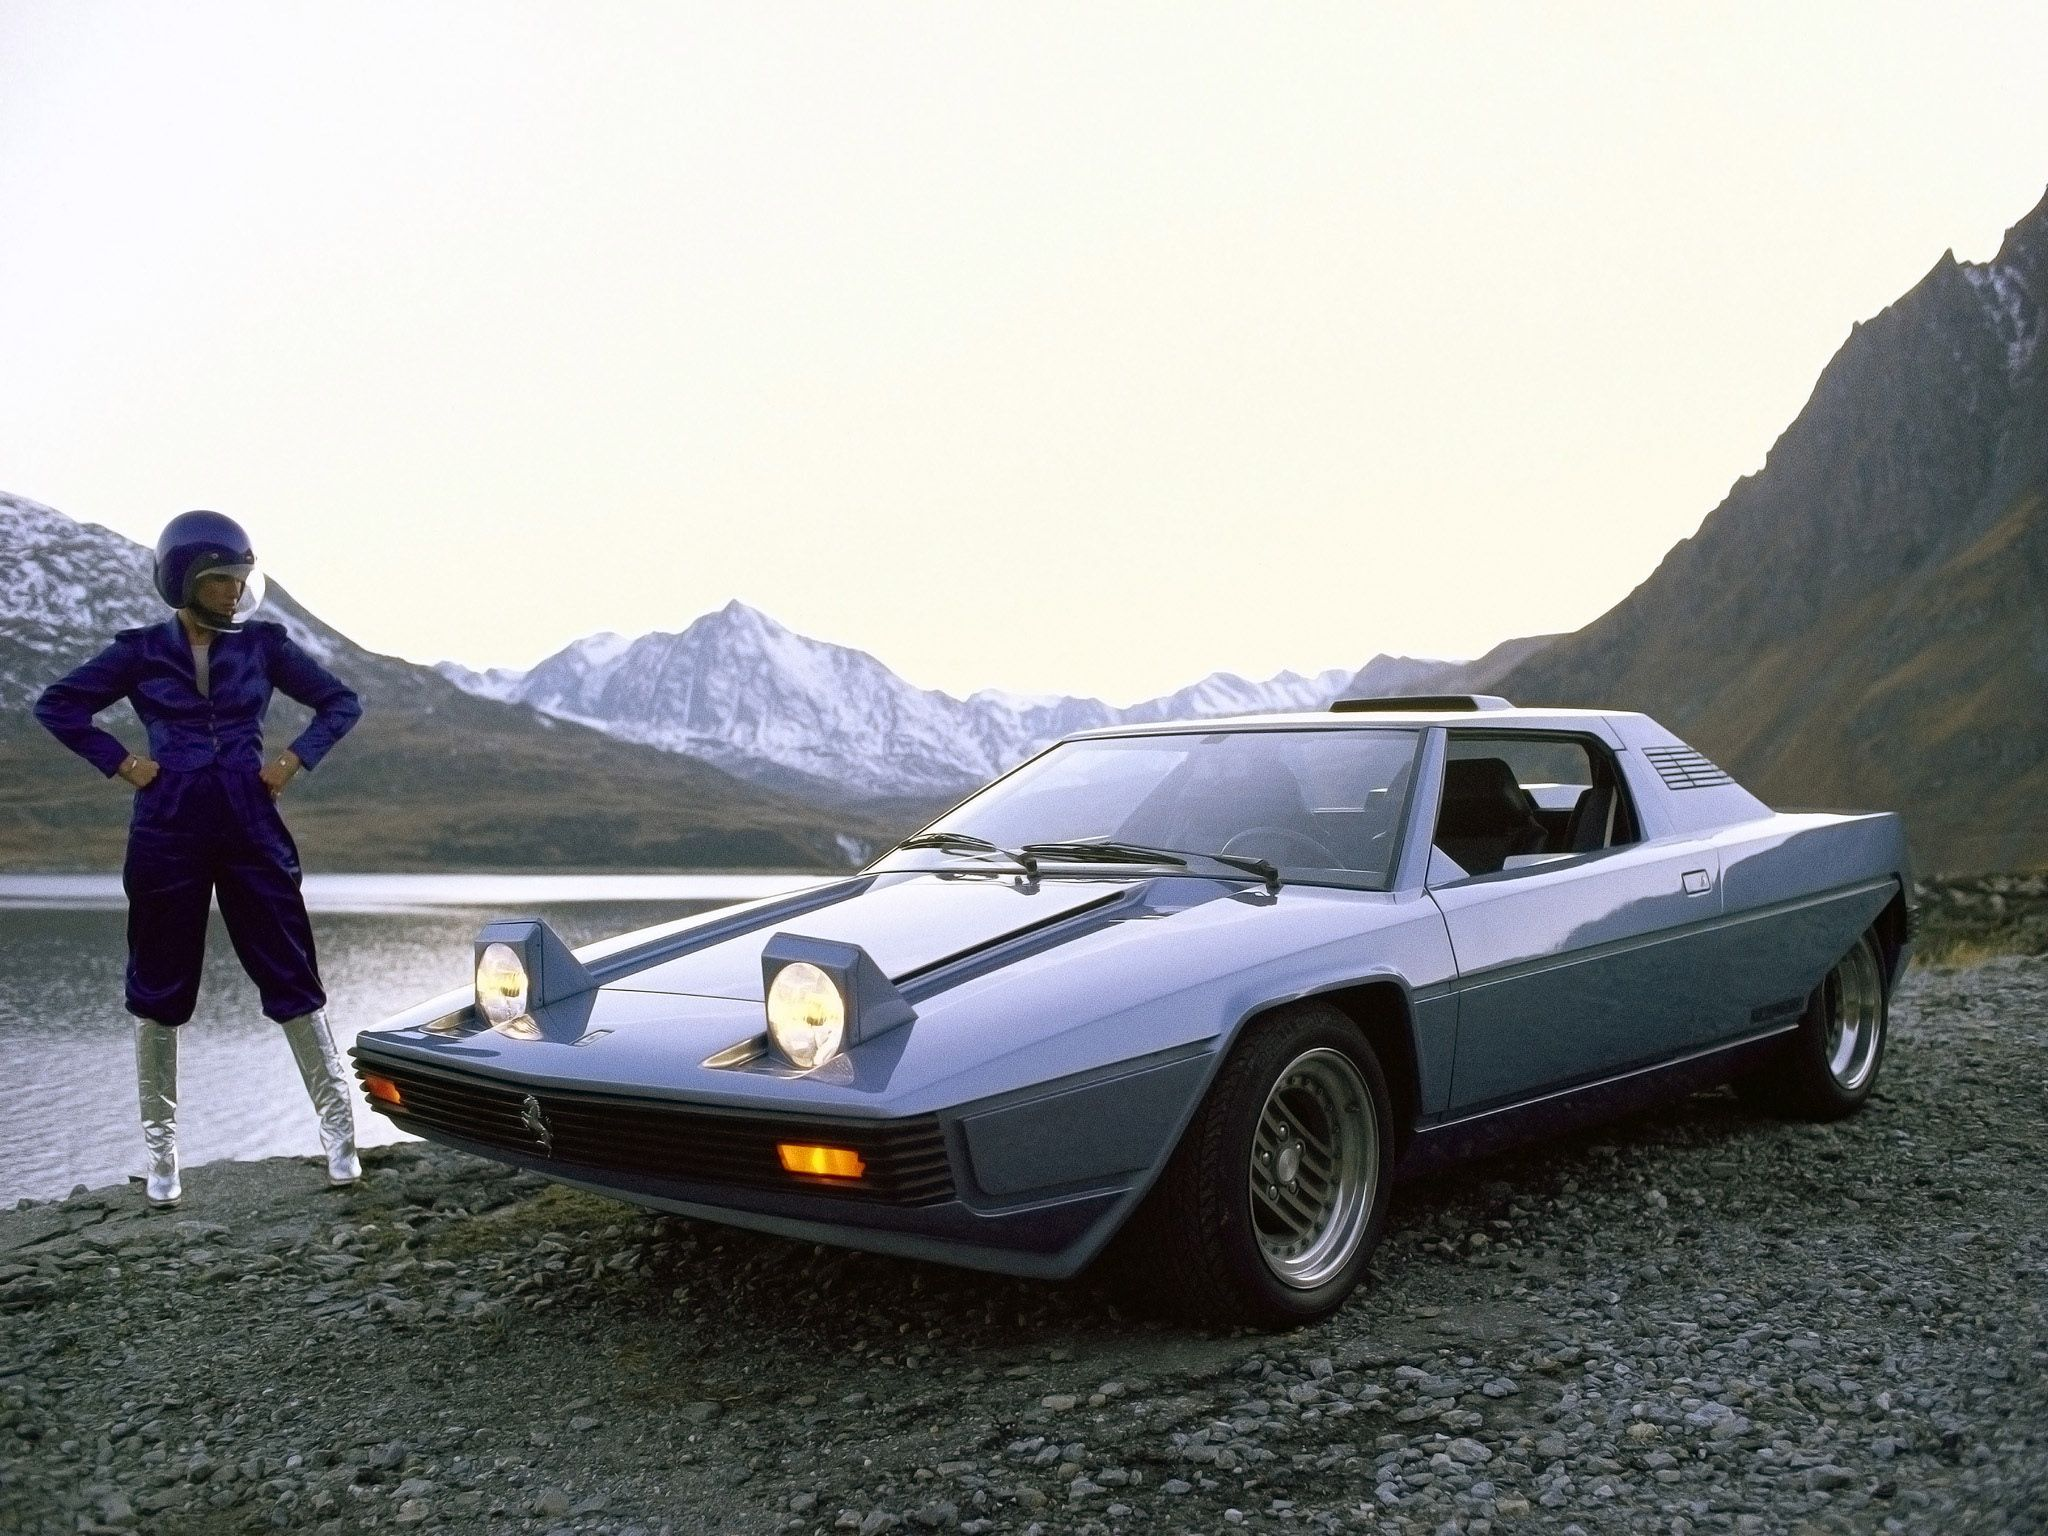 ddf12c2ad6286d5b63ccc156b4ae1567 Fabulous Ferrari Mondial T In Vendita Cars Trend